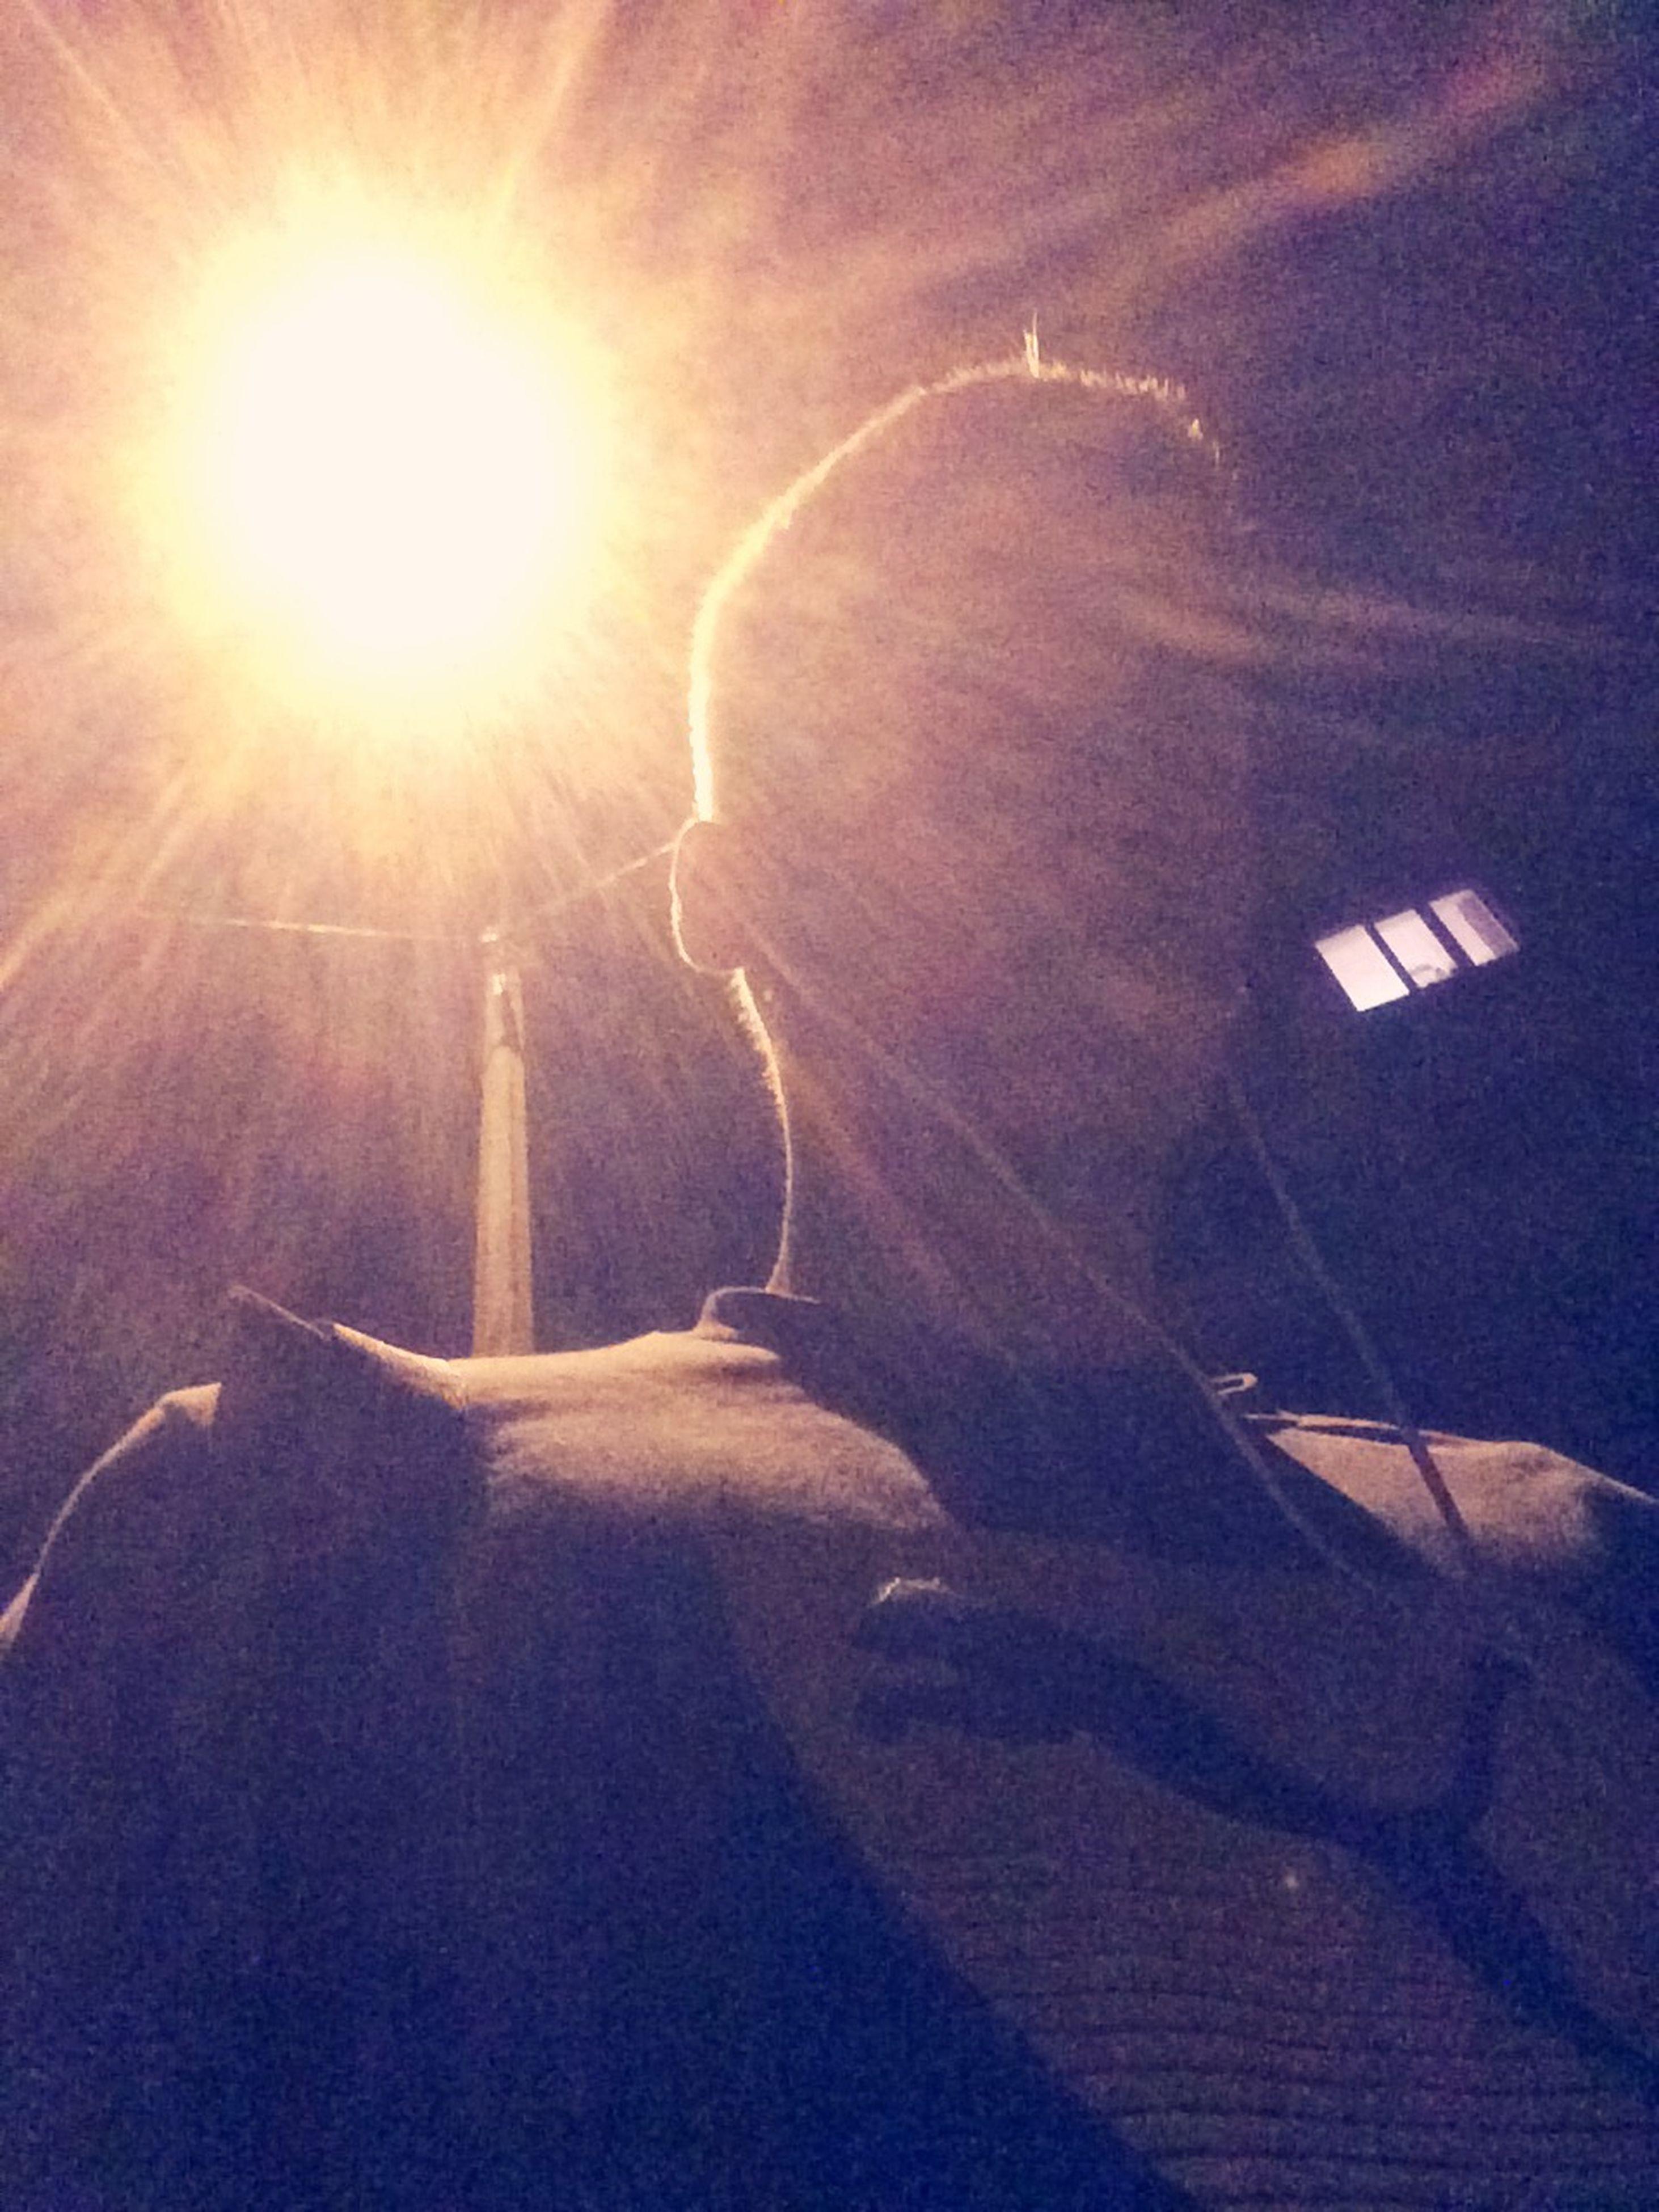 illuminated, lighting equipment, lens flare, sunbeam, street light, night, low angle view, sunlight, lifestyles, leisure activity, silhouette, men, light - natural phenomenon, sun, built structure, architecture, unrecognizable person, sky